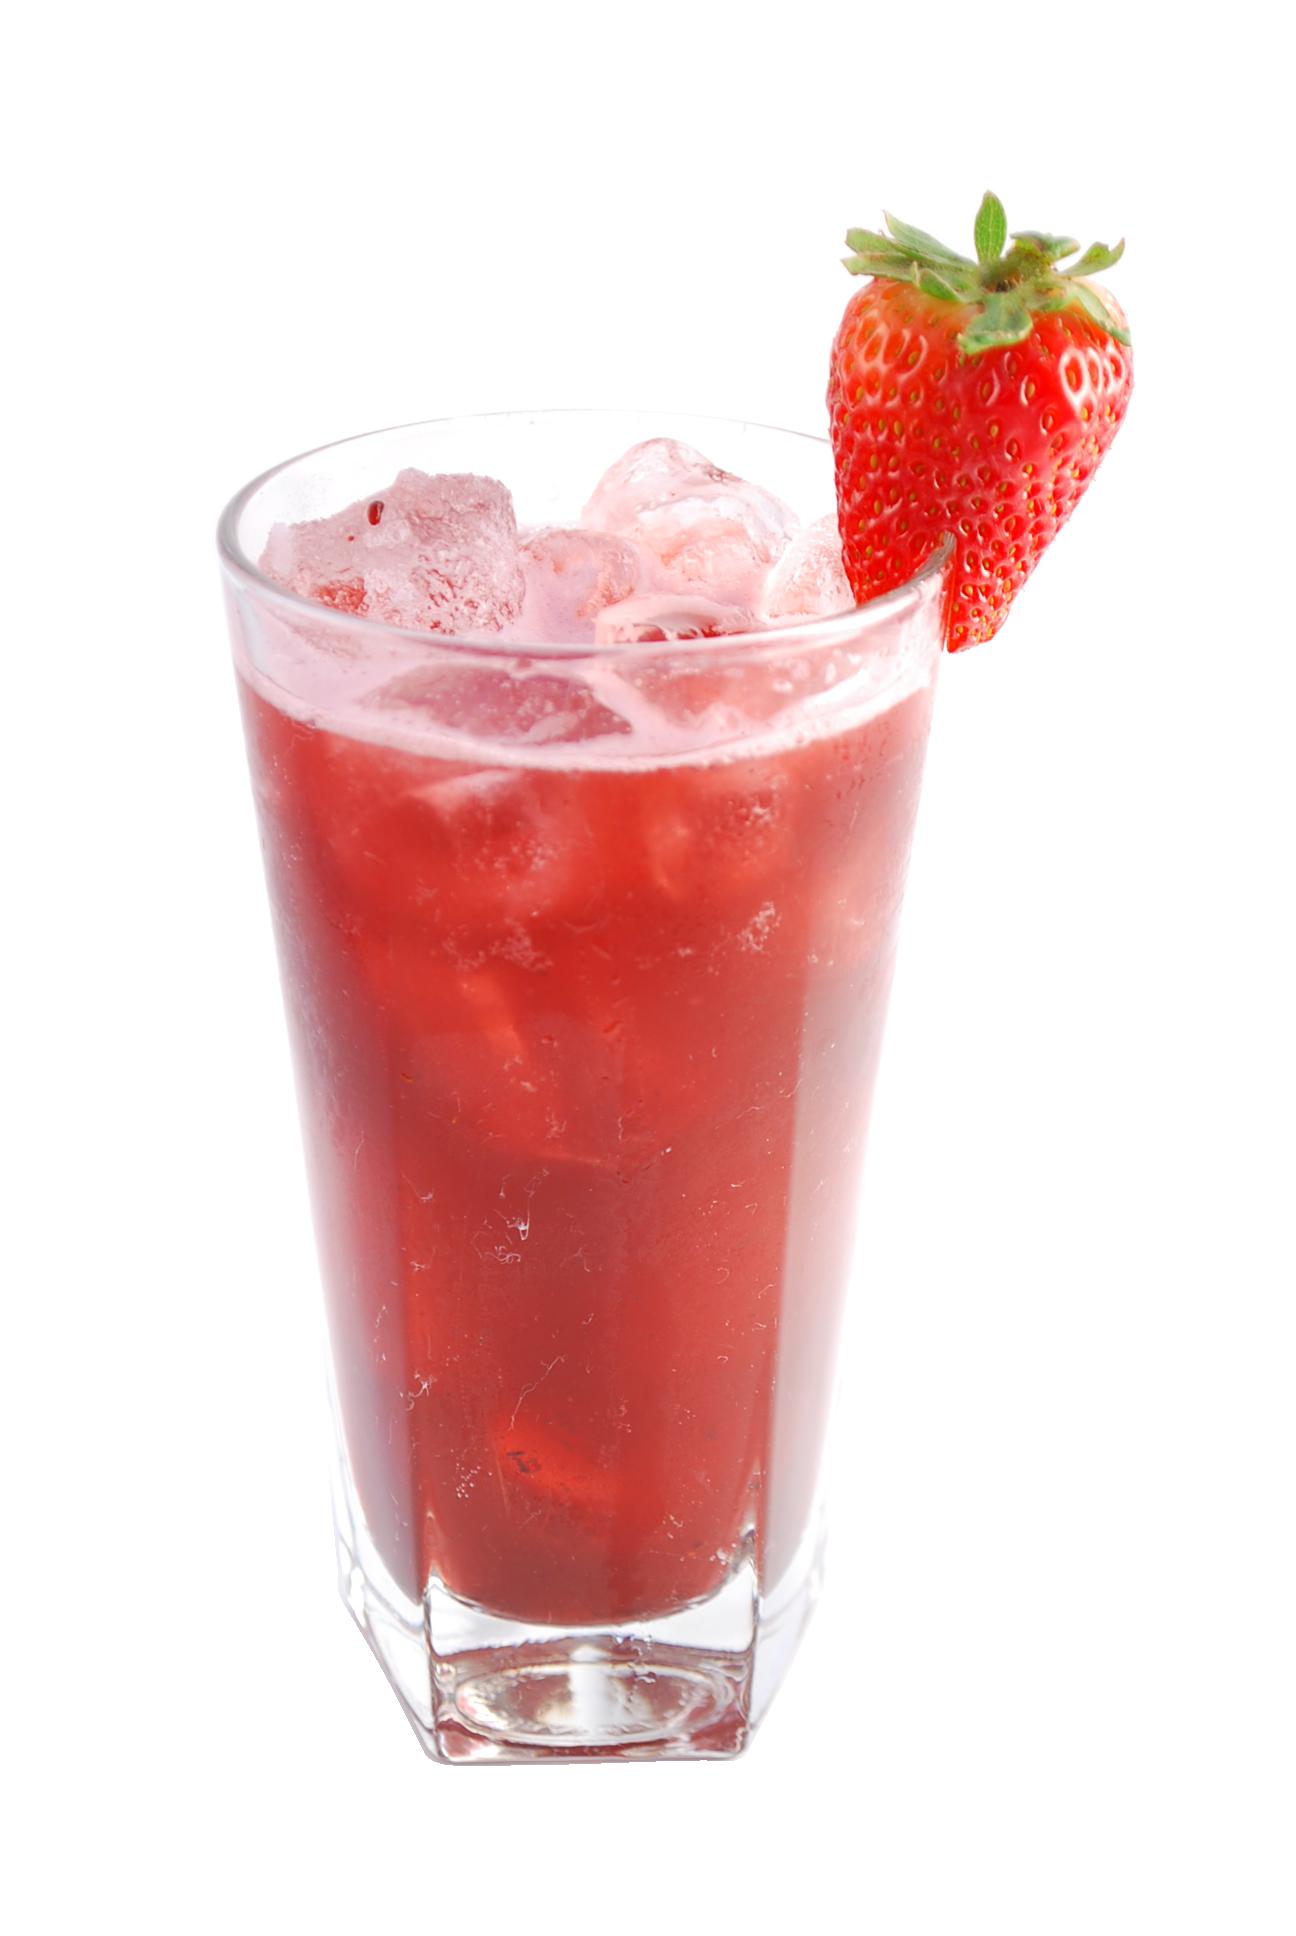 Juice clipart oren. Png images free download